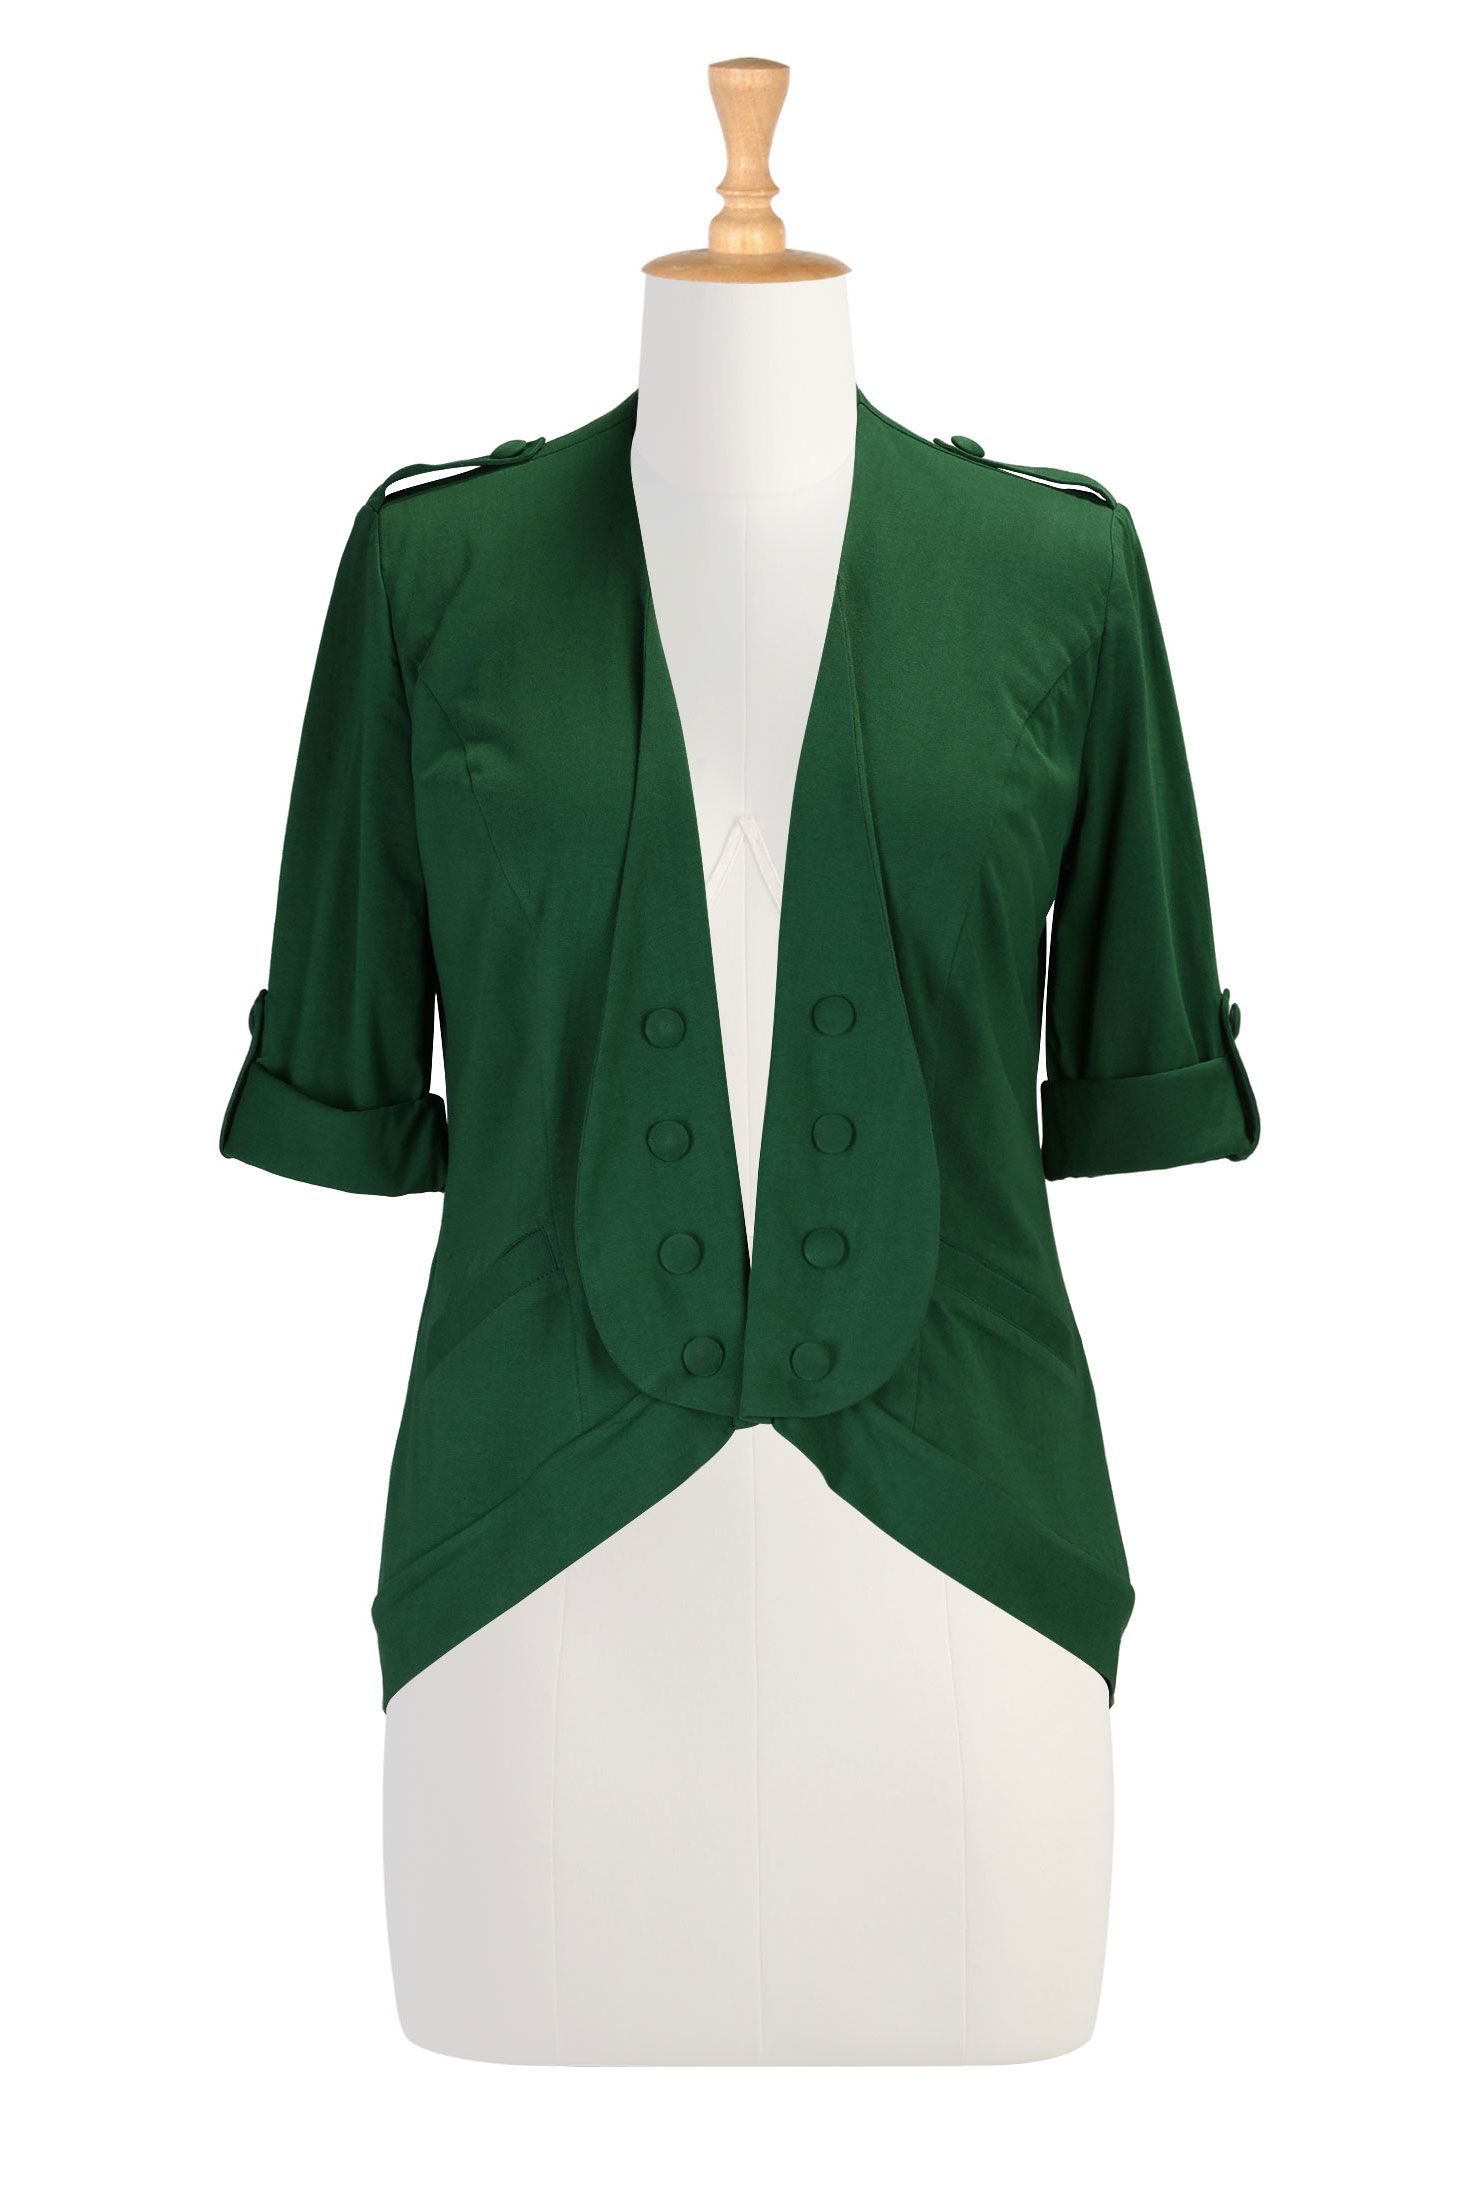 cadde4a05d0a1 Shop womens fashion clothing - Trendy Women s Tops - Shop for Fashion